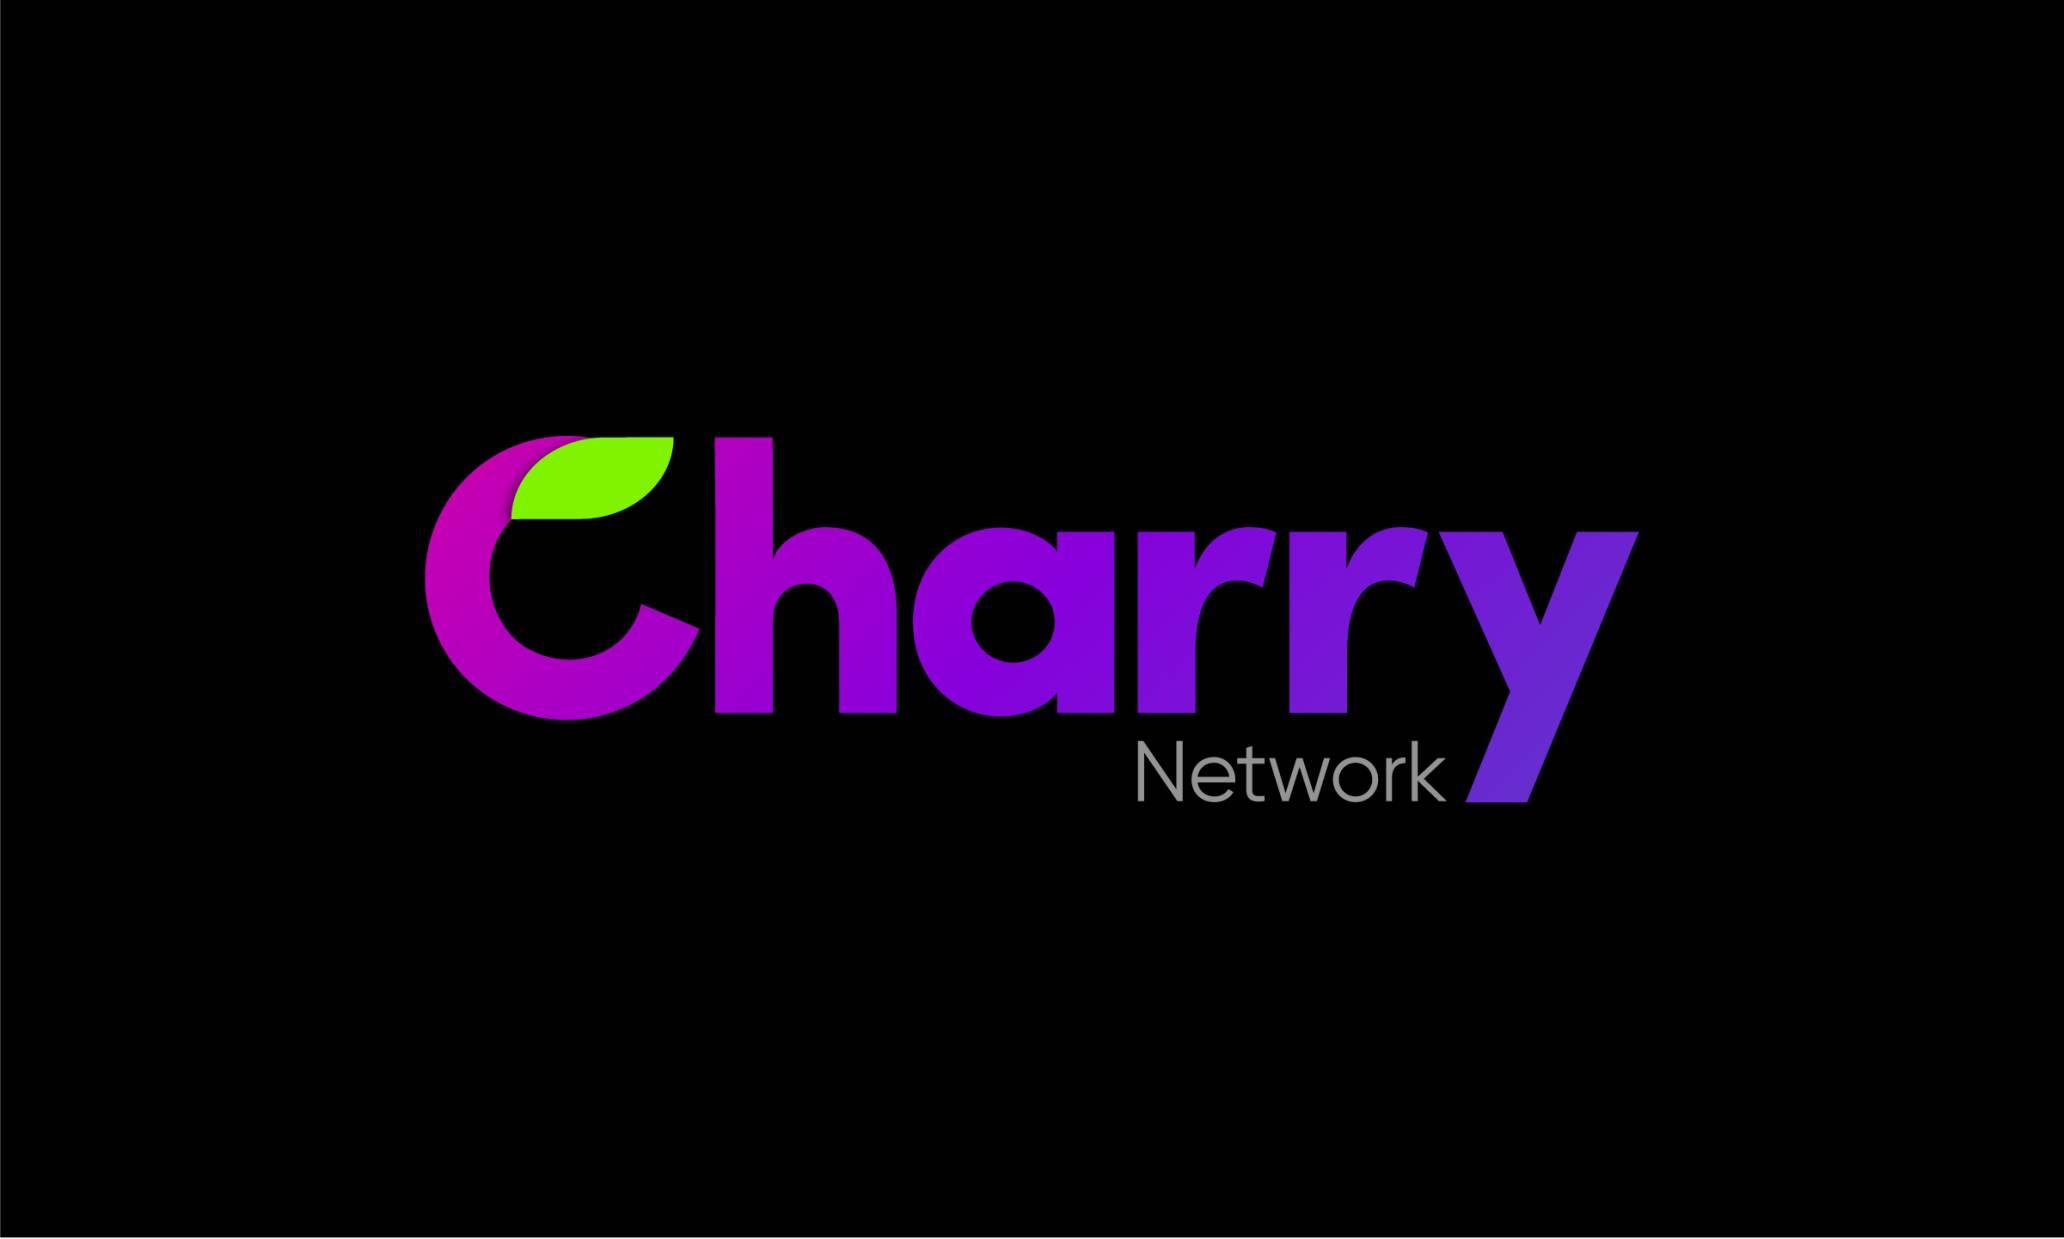 Brand Identity Blockchain Network